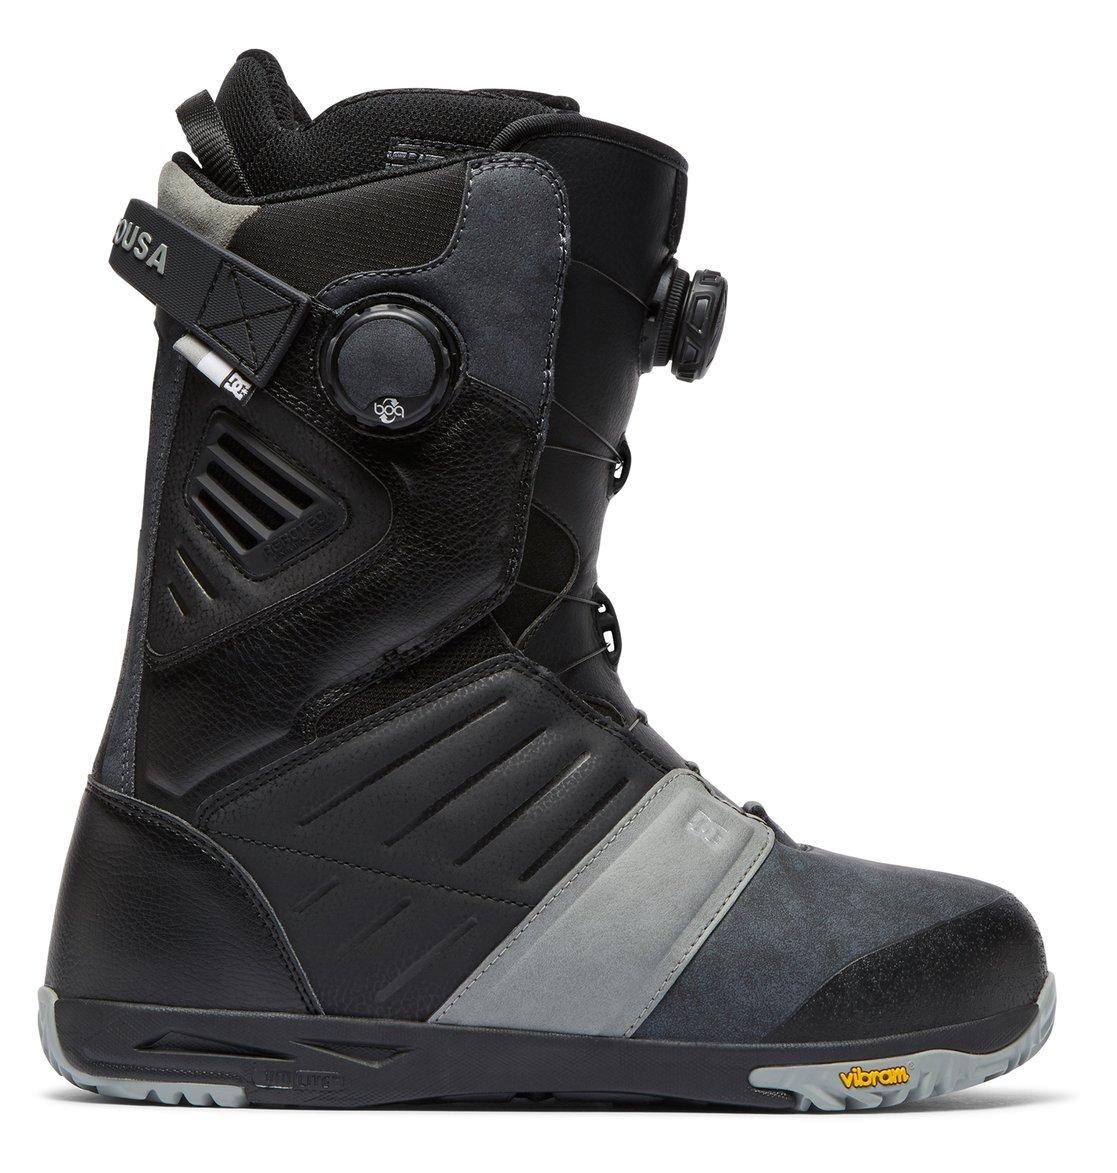 b9f6ce9e69d9 Judge boa snowboard boots black adyo shoes jpg 1117x1173 Custom snowboard  boots